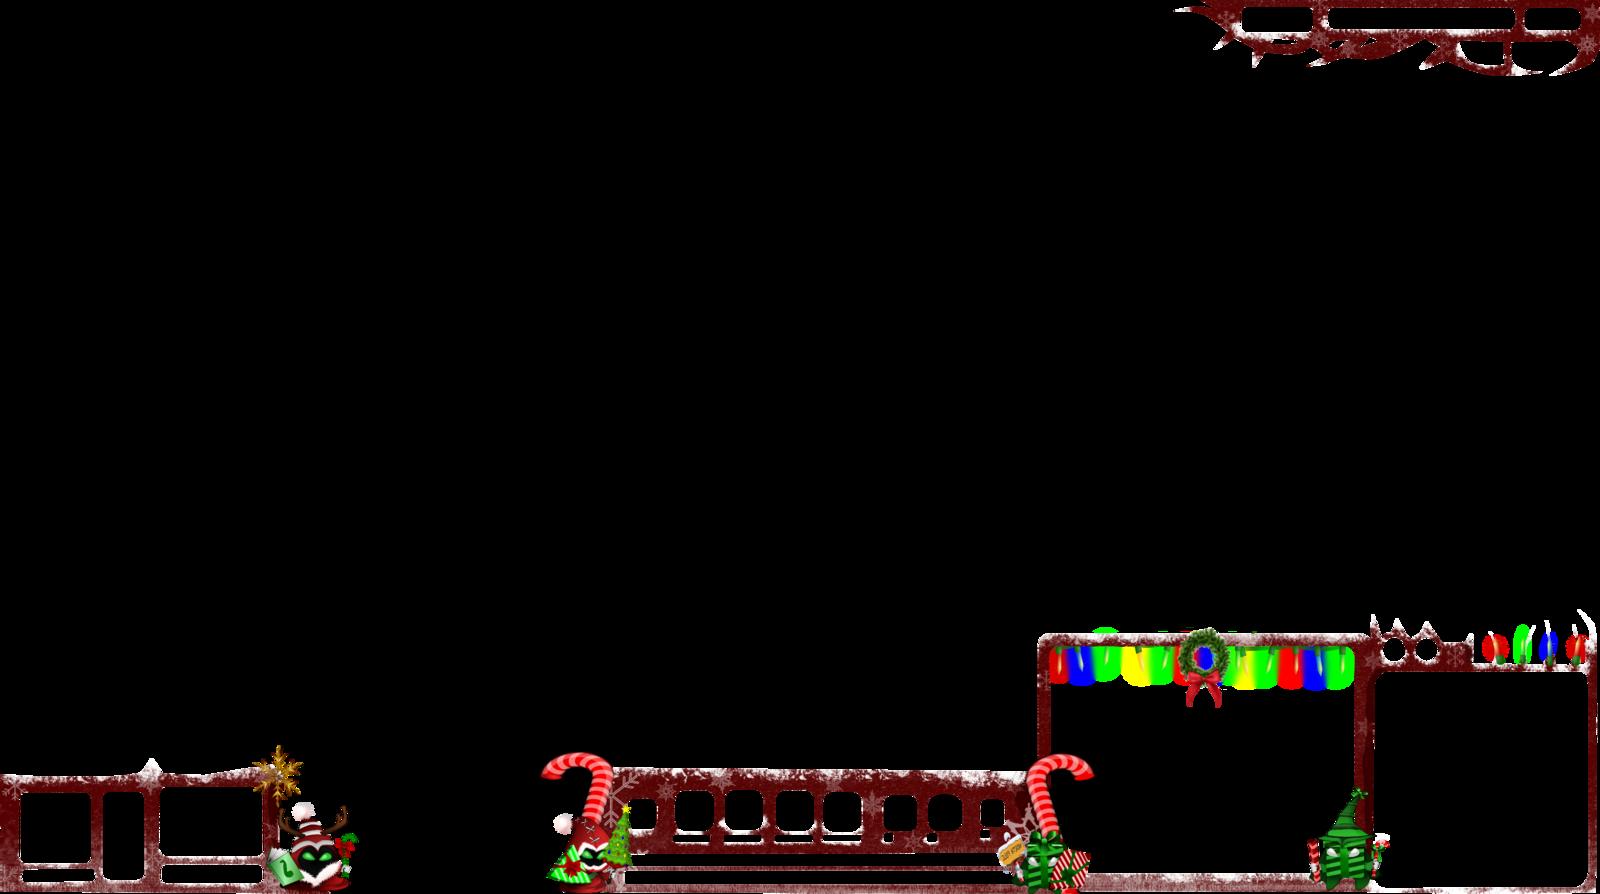 Minions League Of Legends Christmas Overlay Stream - Minions